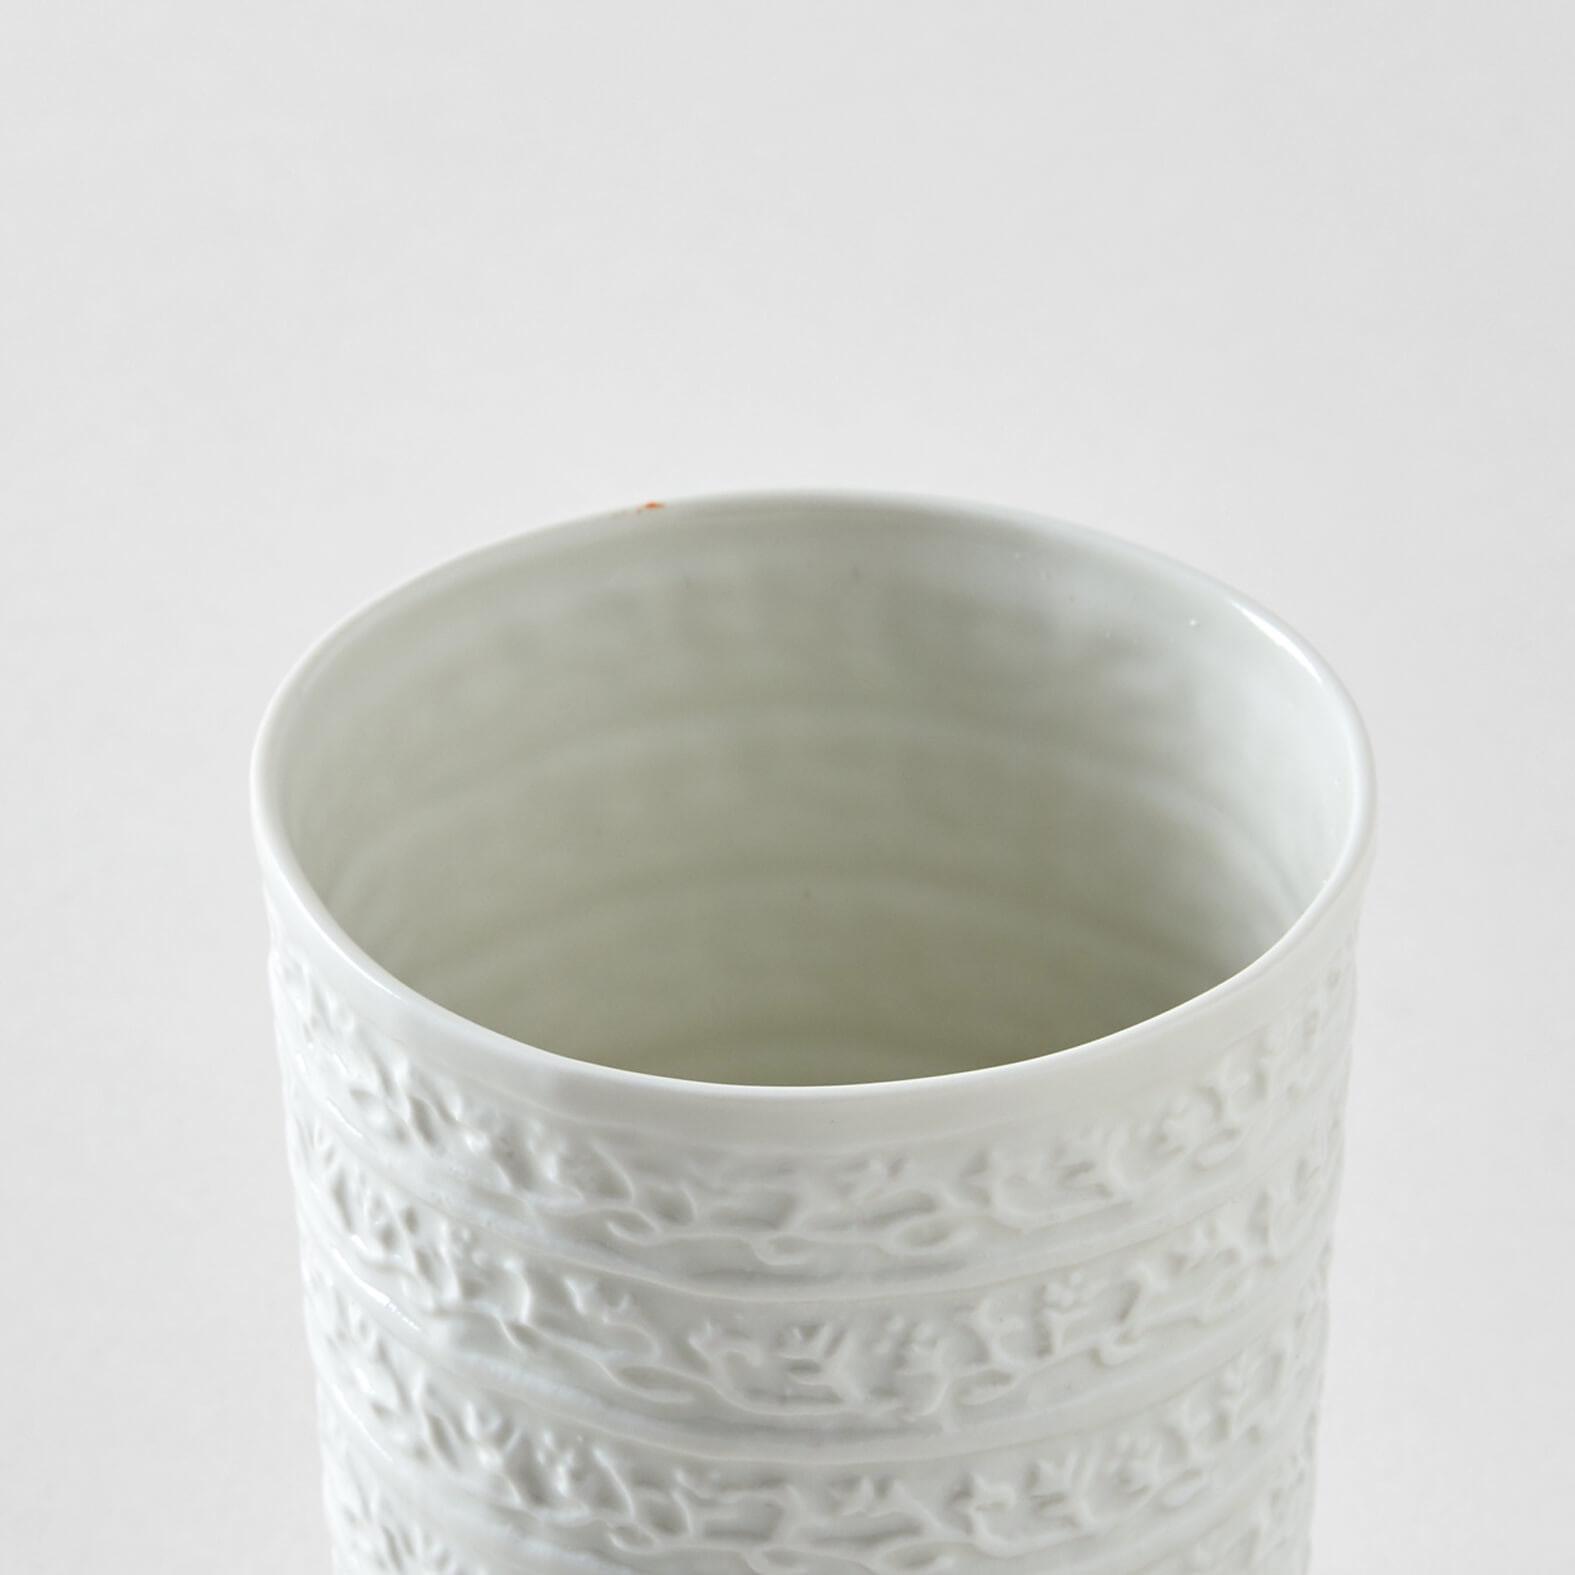 alix d reynis arabie latte tumbler bodhi tree. Black Bedroom Furniture Sets. Home Design Ideas